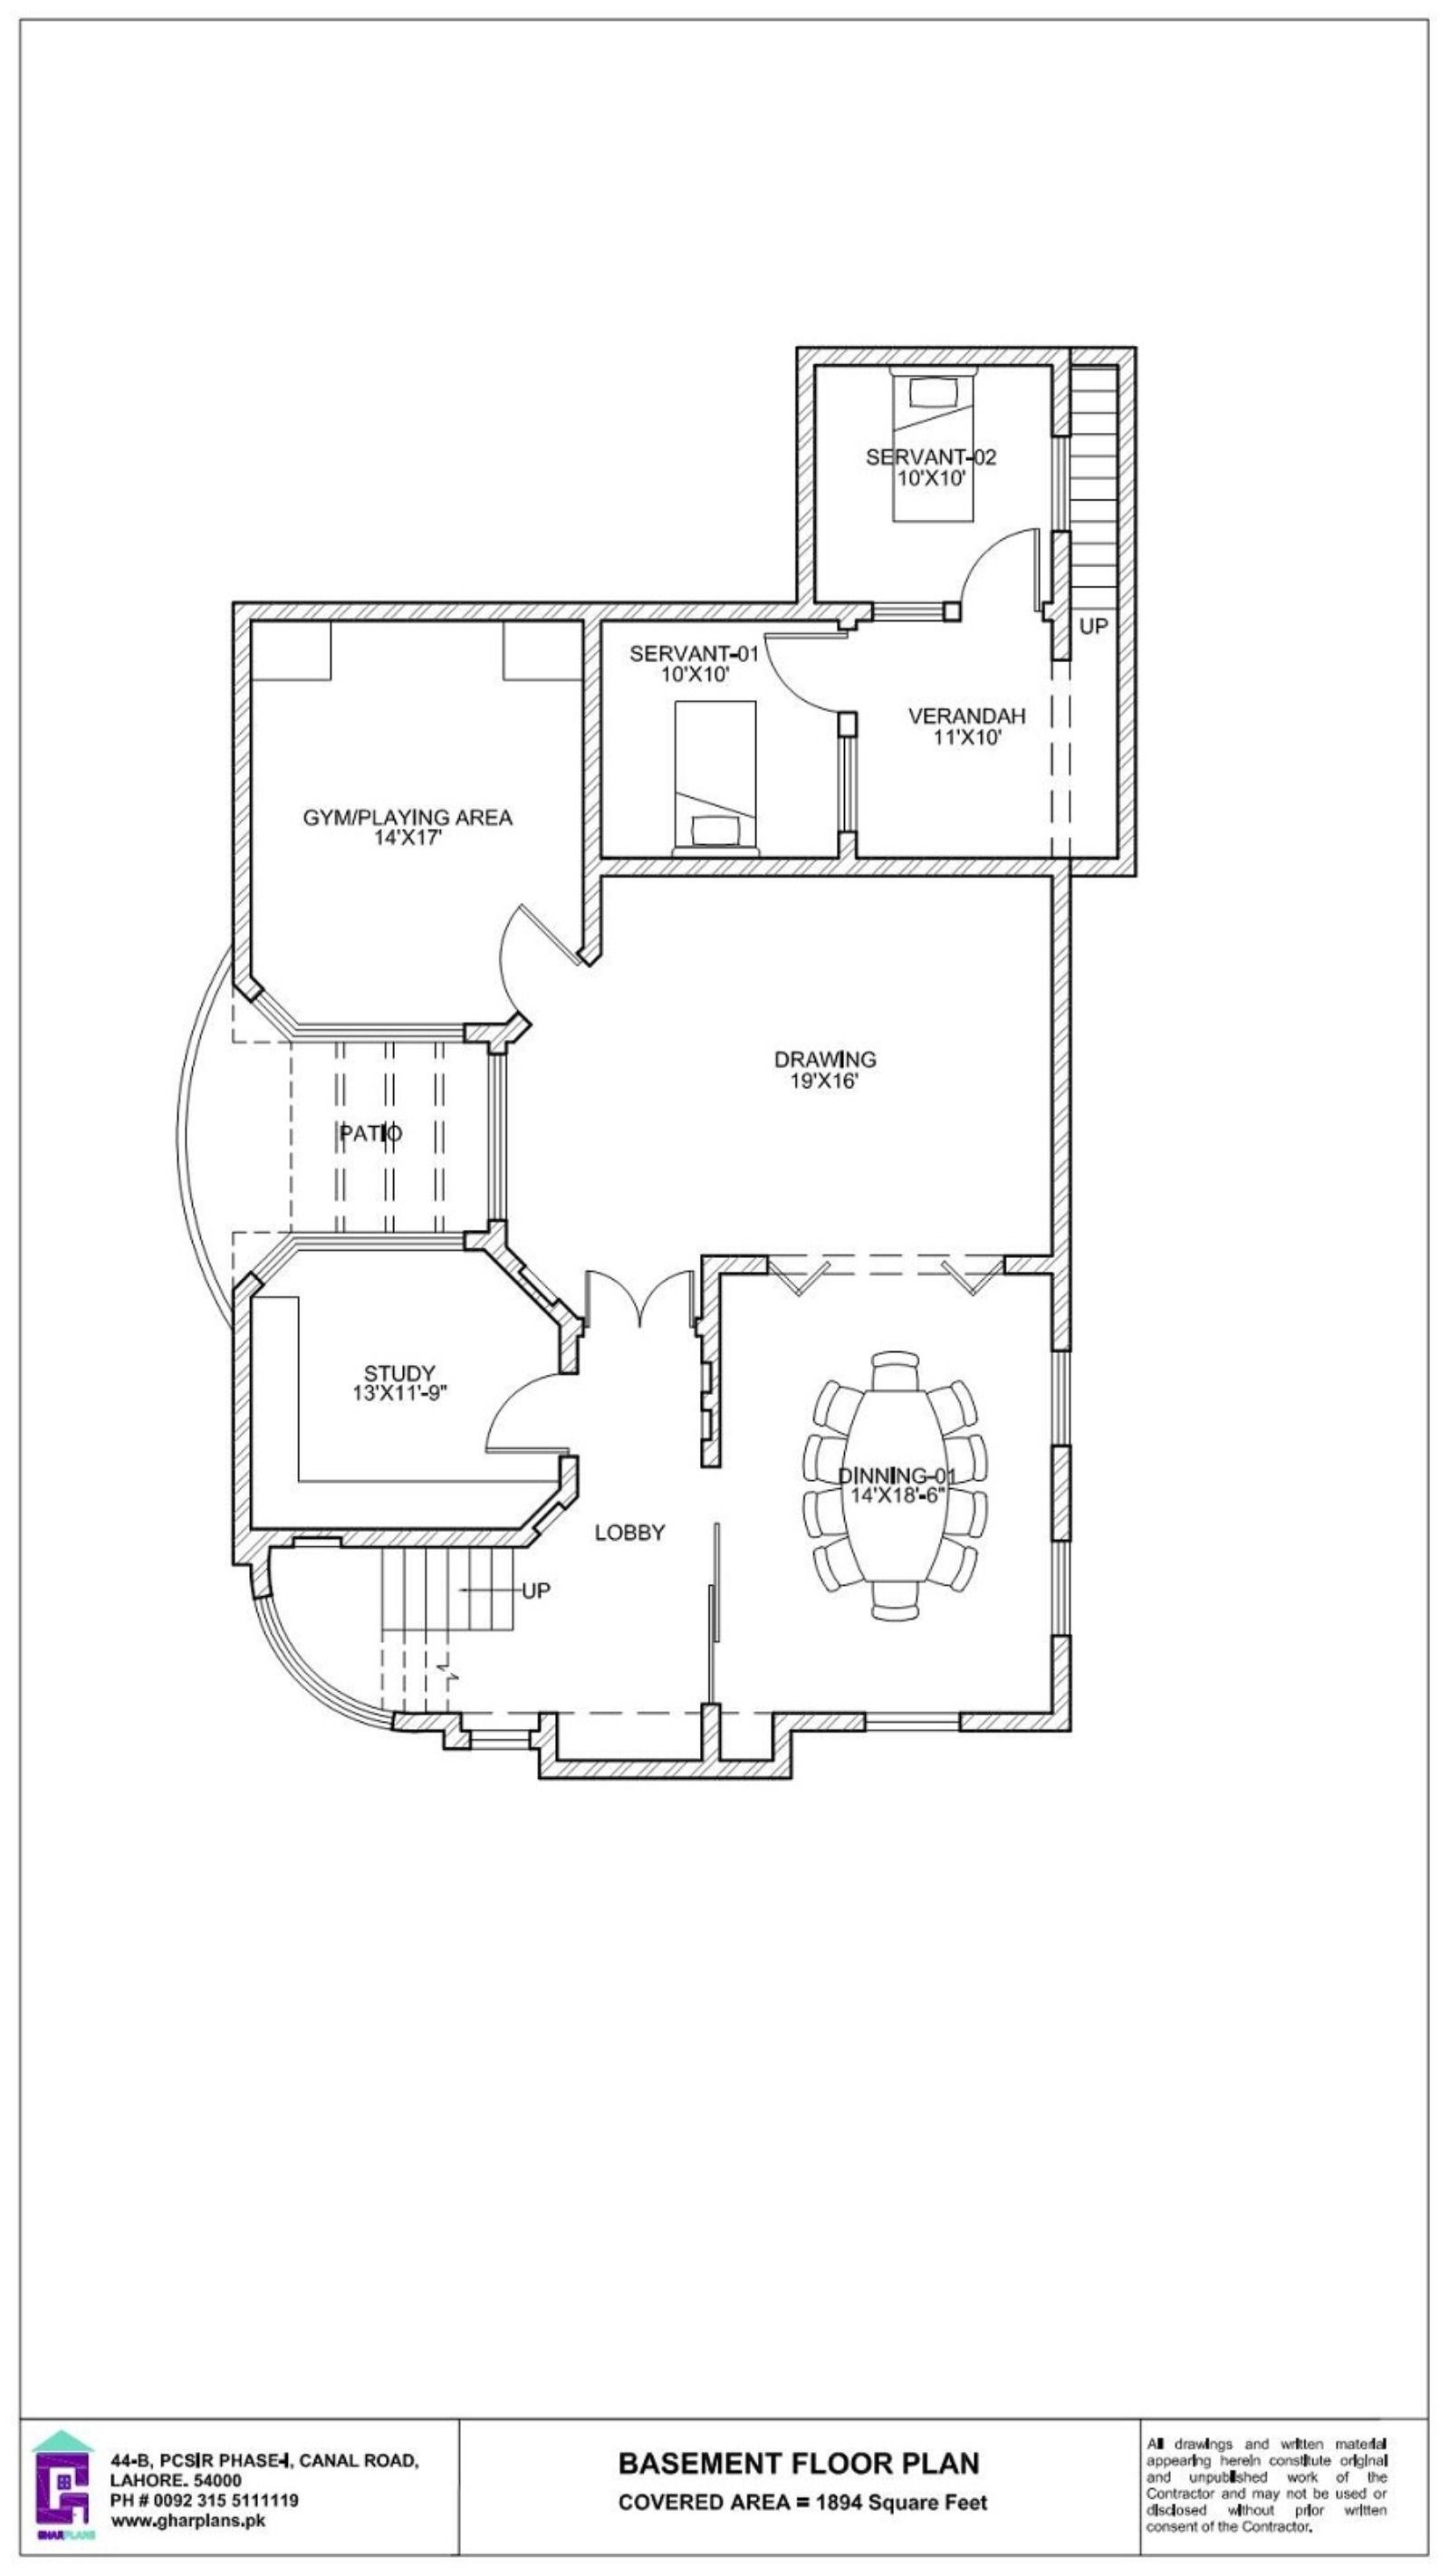 50 X 90 House Basement Floor Plan 500 Sq Yard Basement Floor Plans Floor Plan Layout House Plans